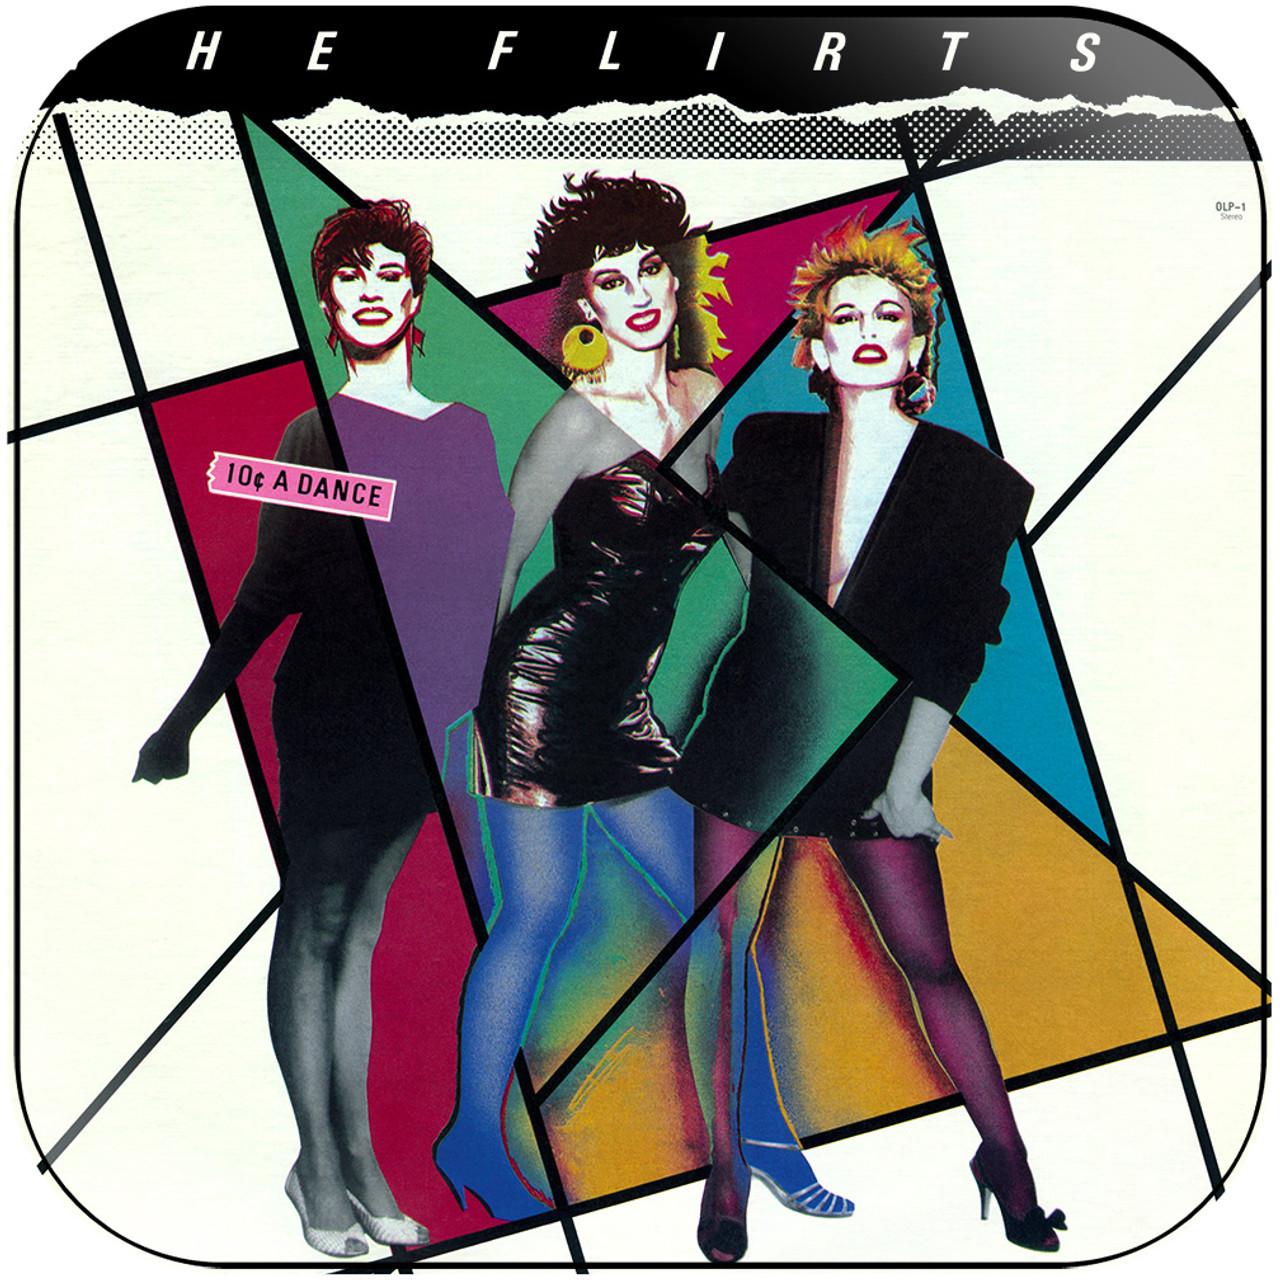 The Flirts 10 A Dance Album Cover Sticker